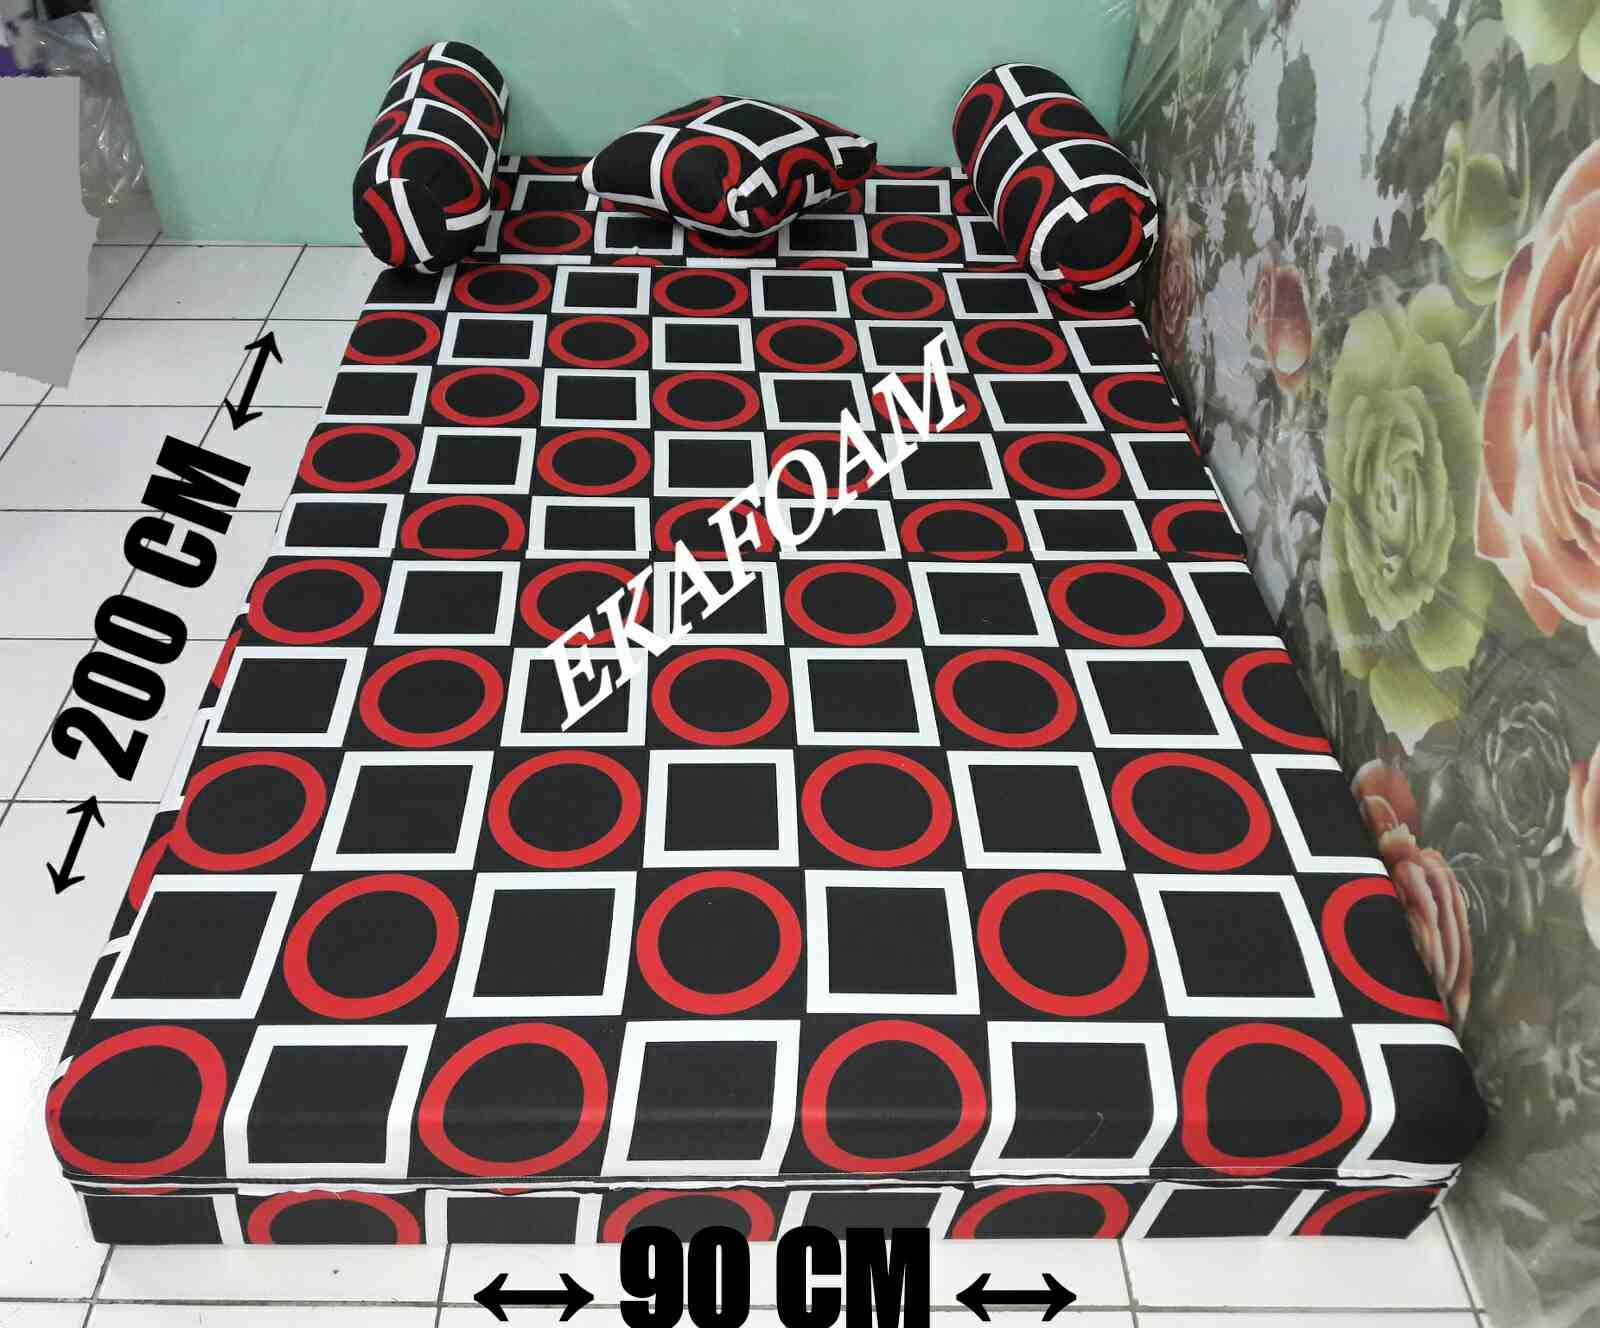 Harga Sofa Bed Inoac 2017 Sleeper Mattress Topper Kasur Terbaru Desember Agen Jual